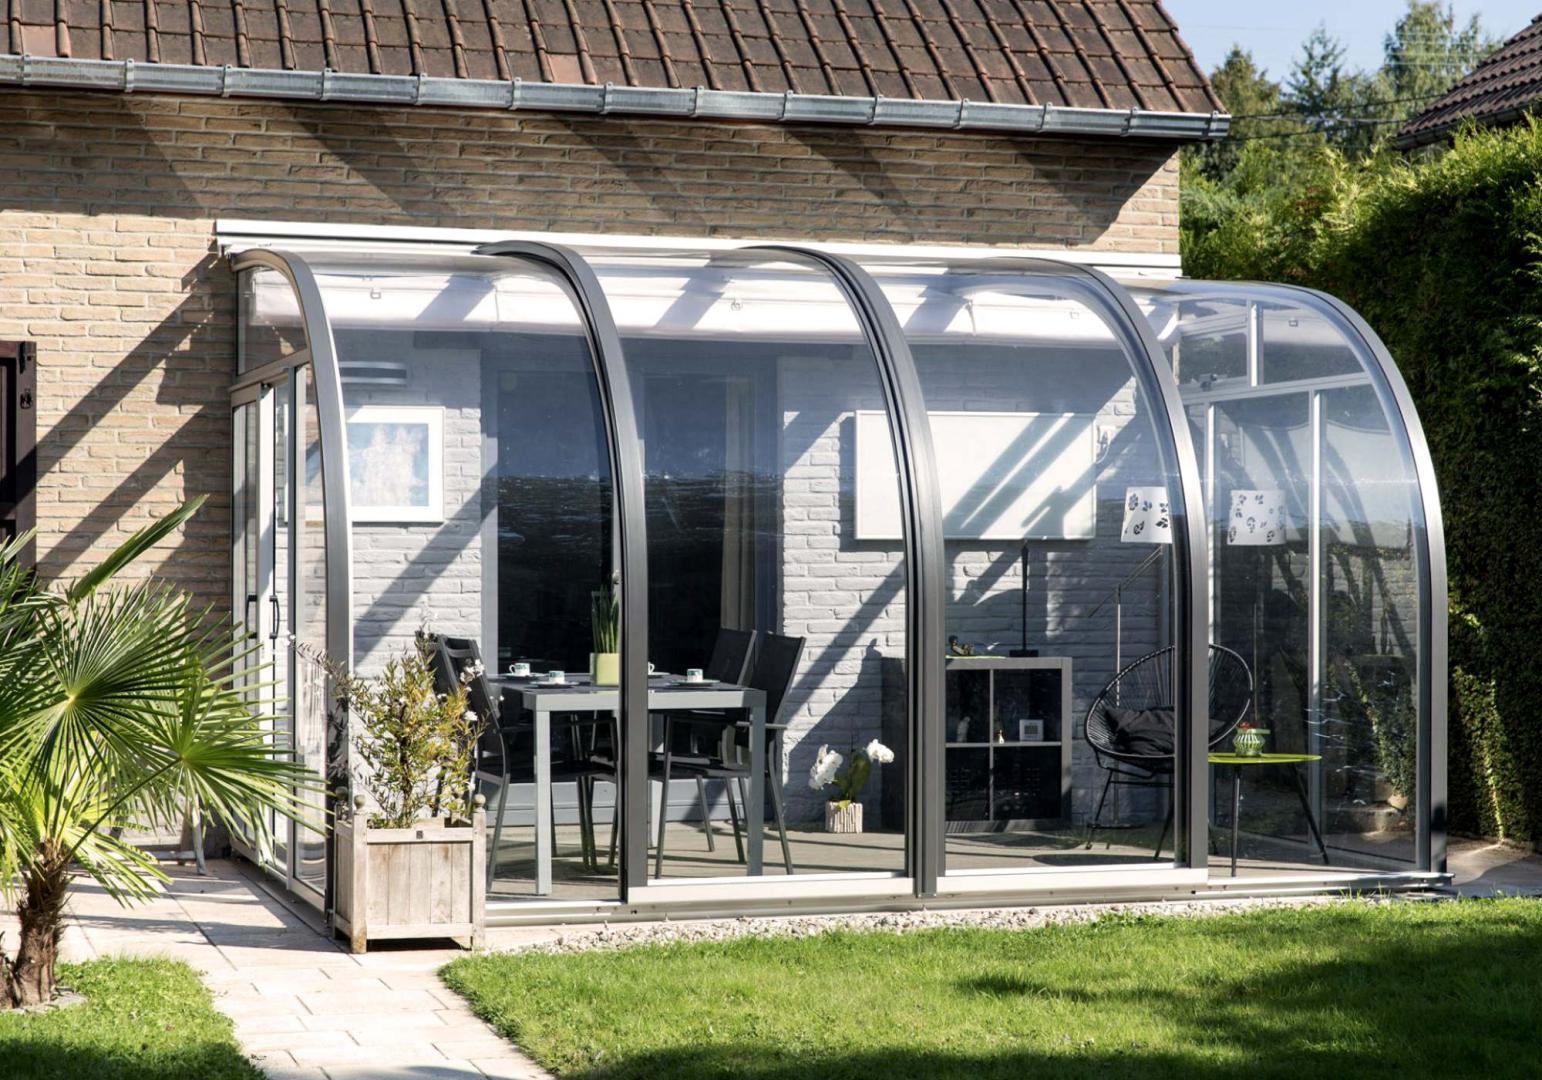 Www Abri Terrasse Com abris solar verandas rétractables i abri et véranda terrasse